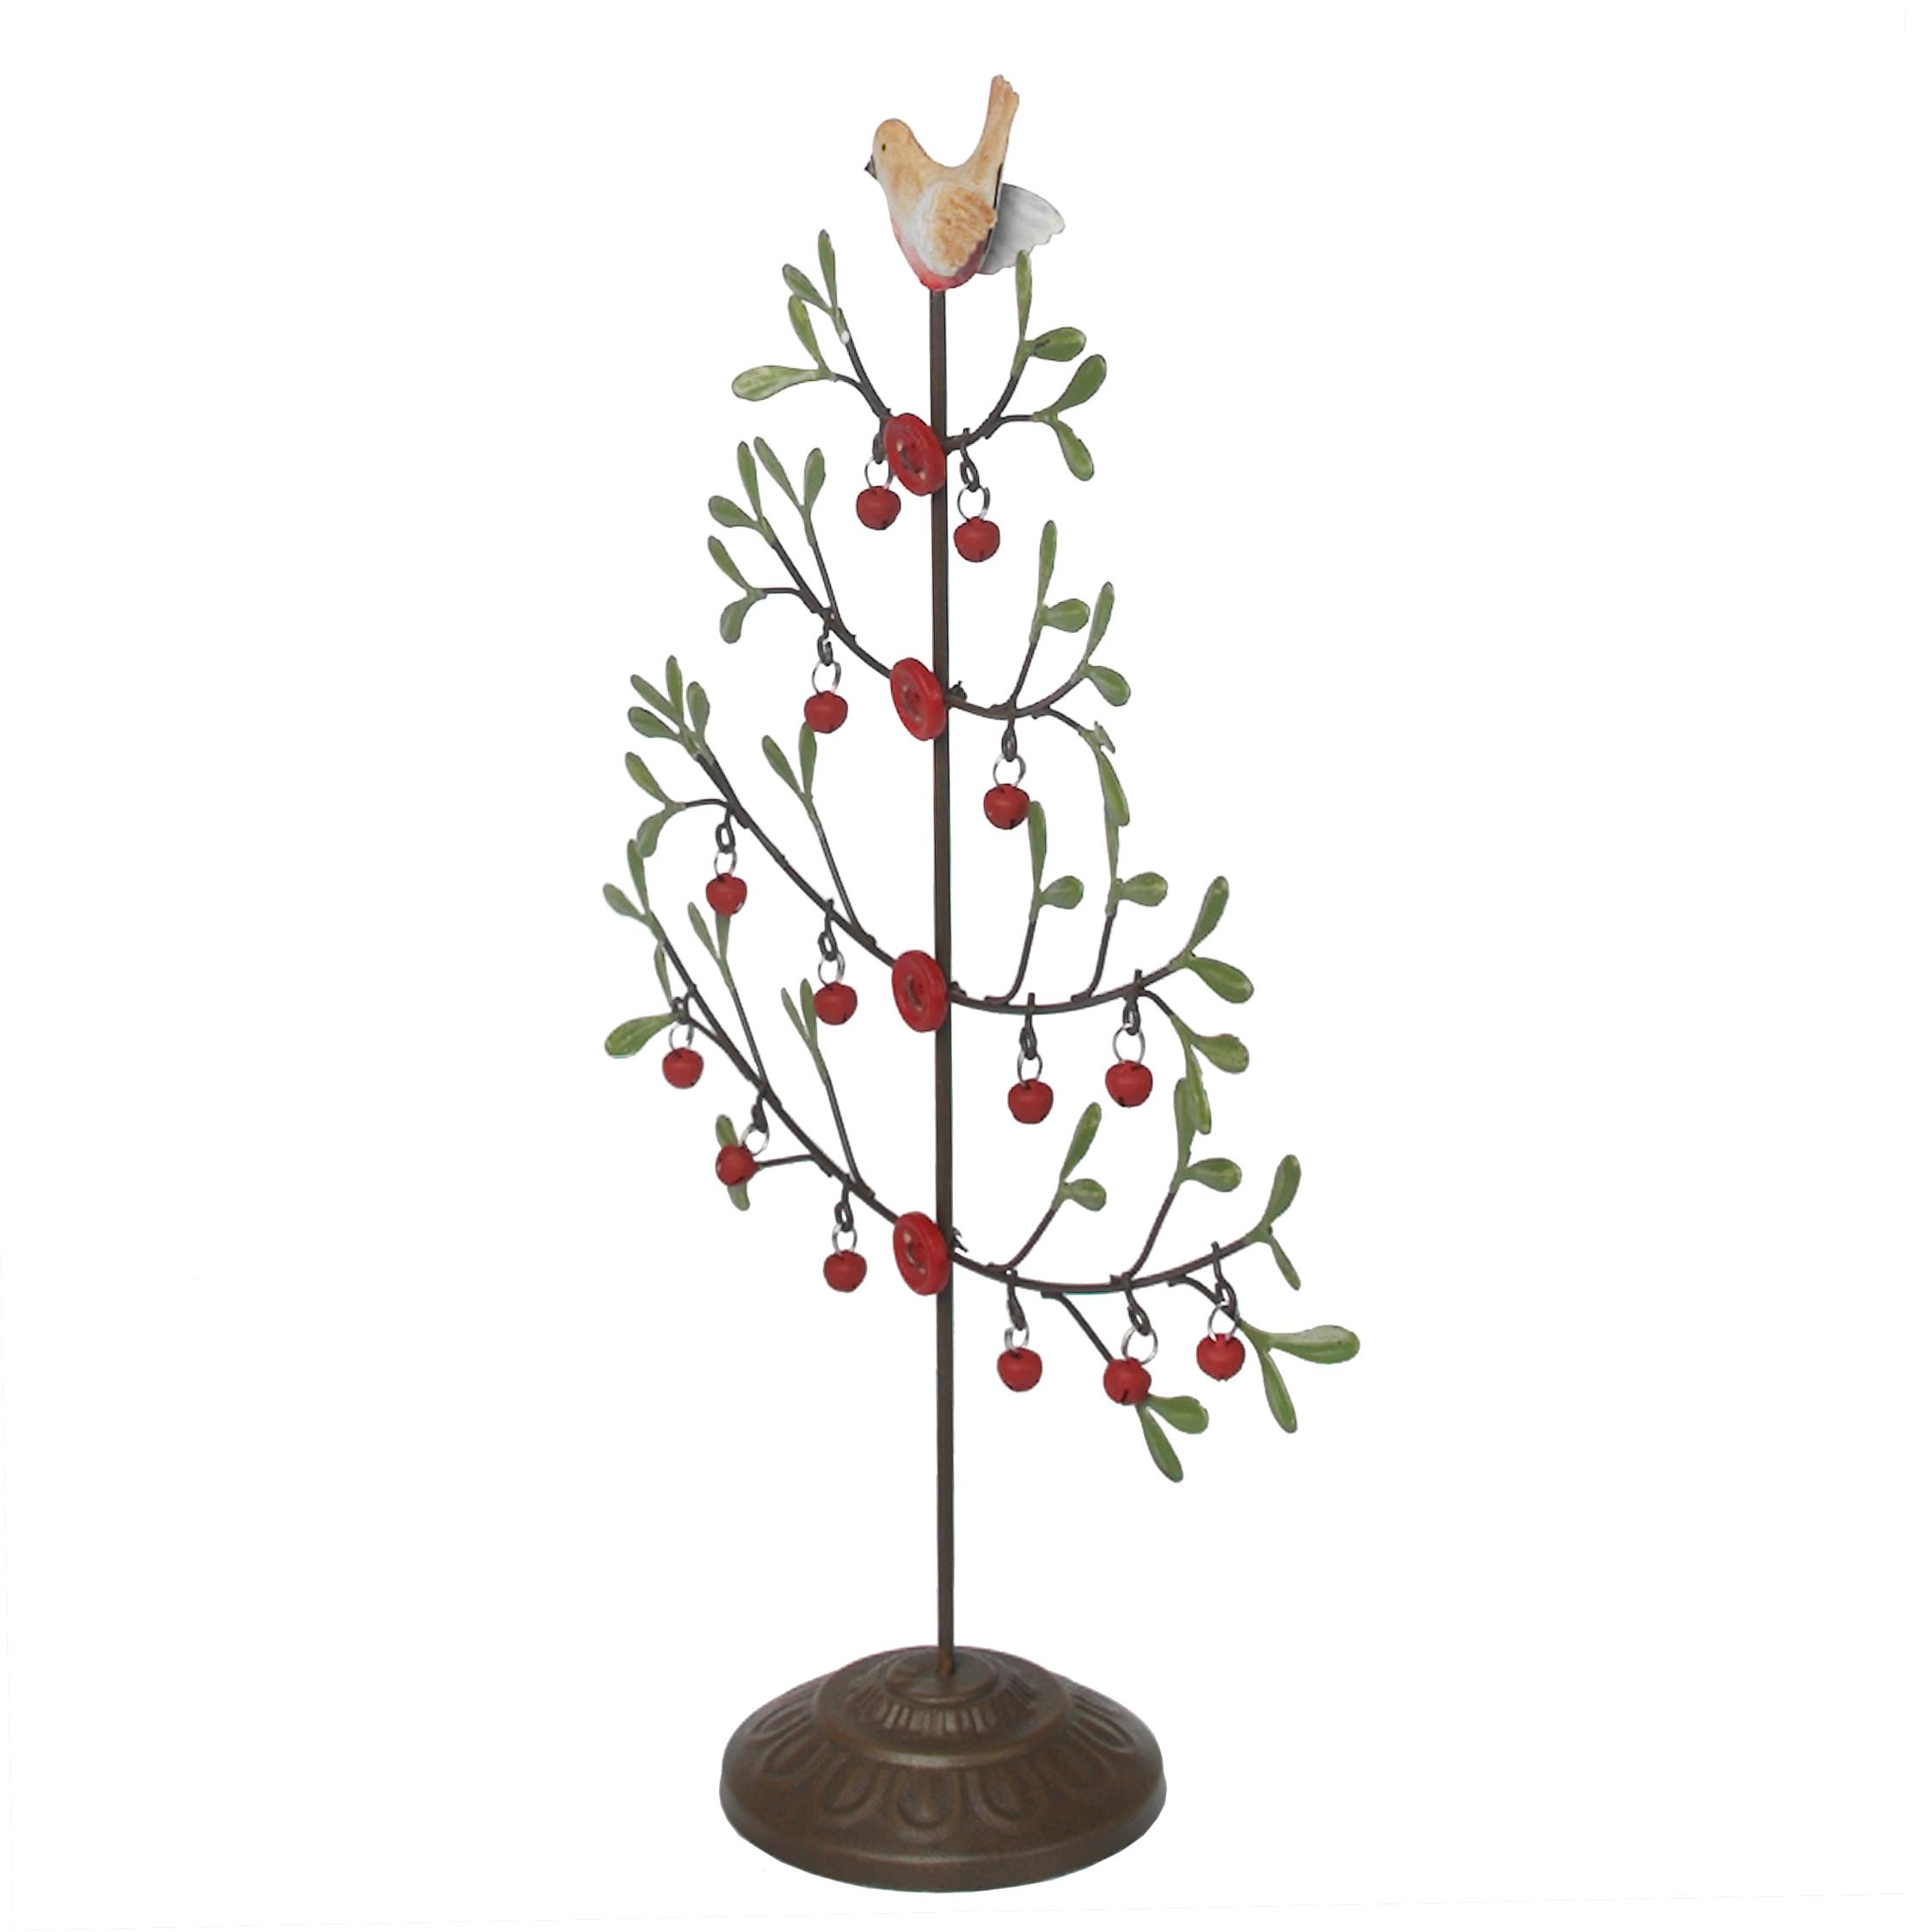 Metal Tabletop Christmas Tree: Mistletoe Christmas Tree With Robin